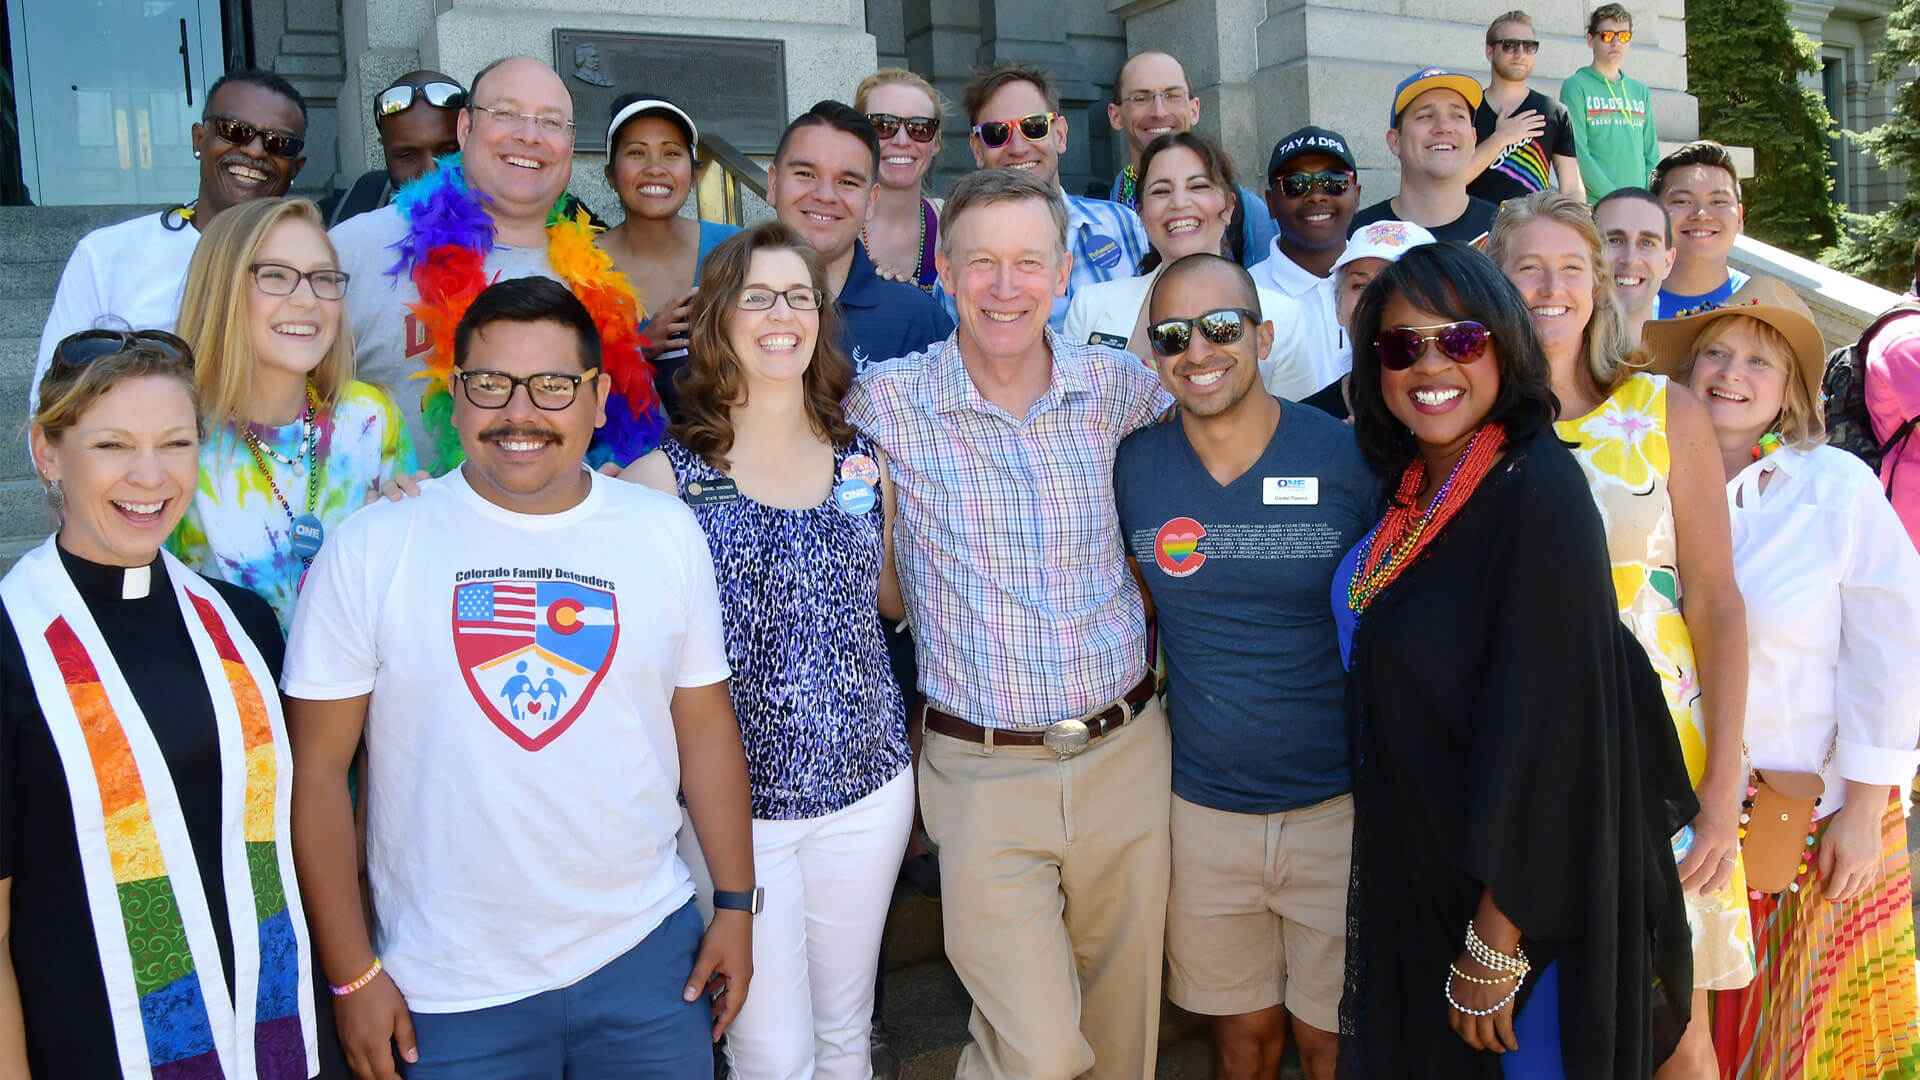 Volunteer at Denver Pride